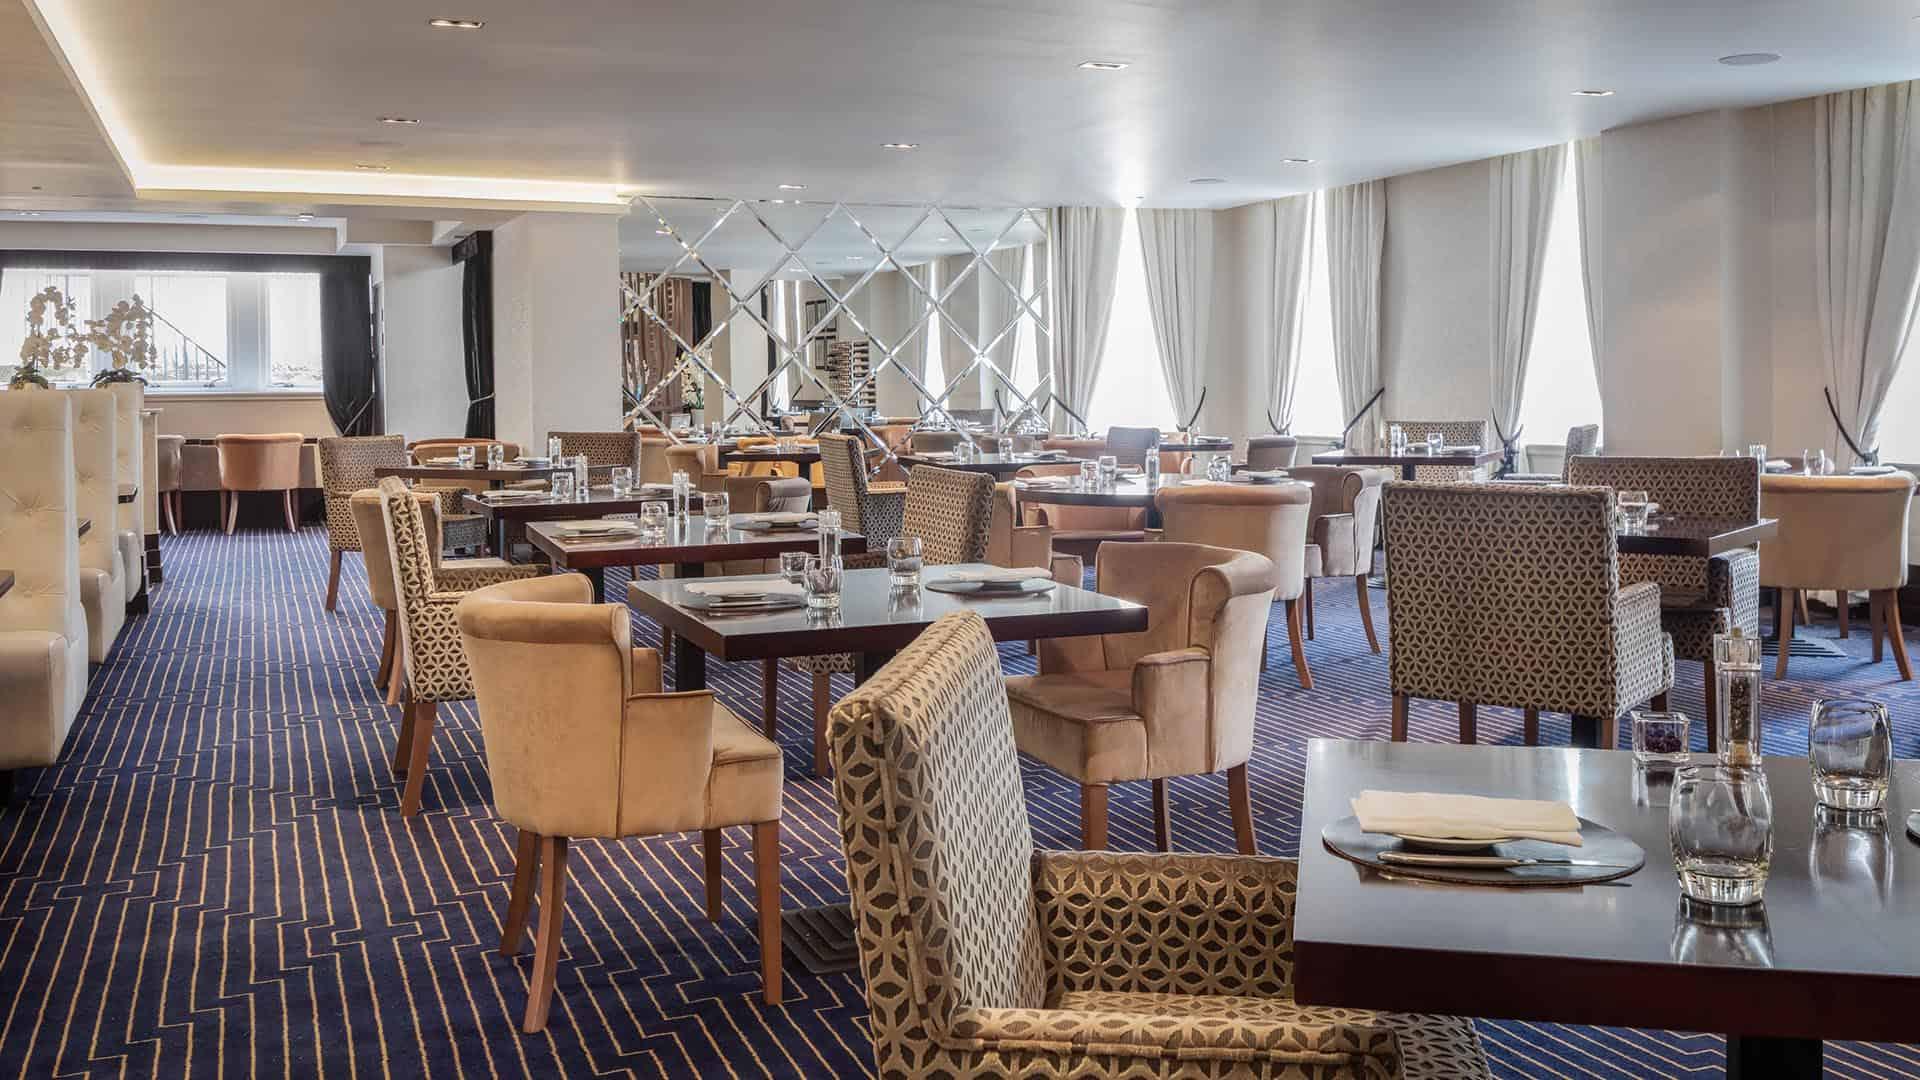 hotelcolessio_Restaurant1_1920x600